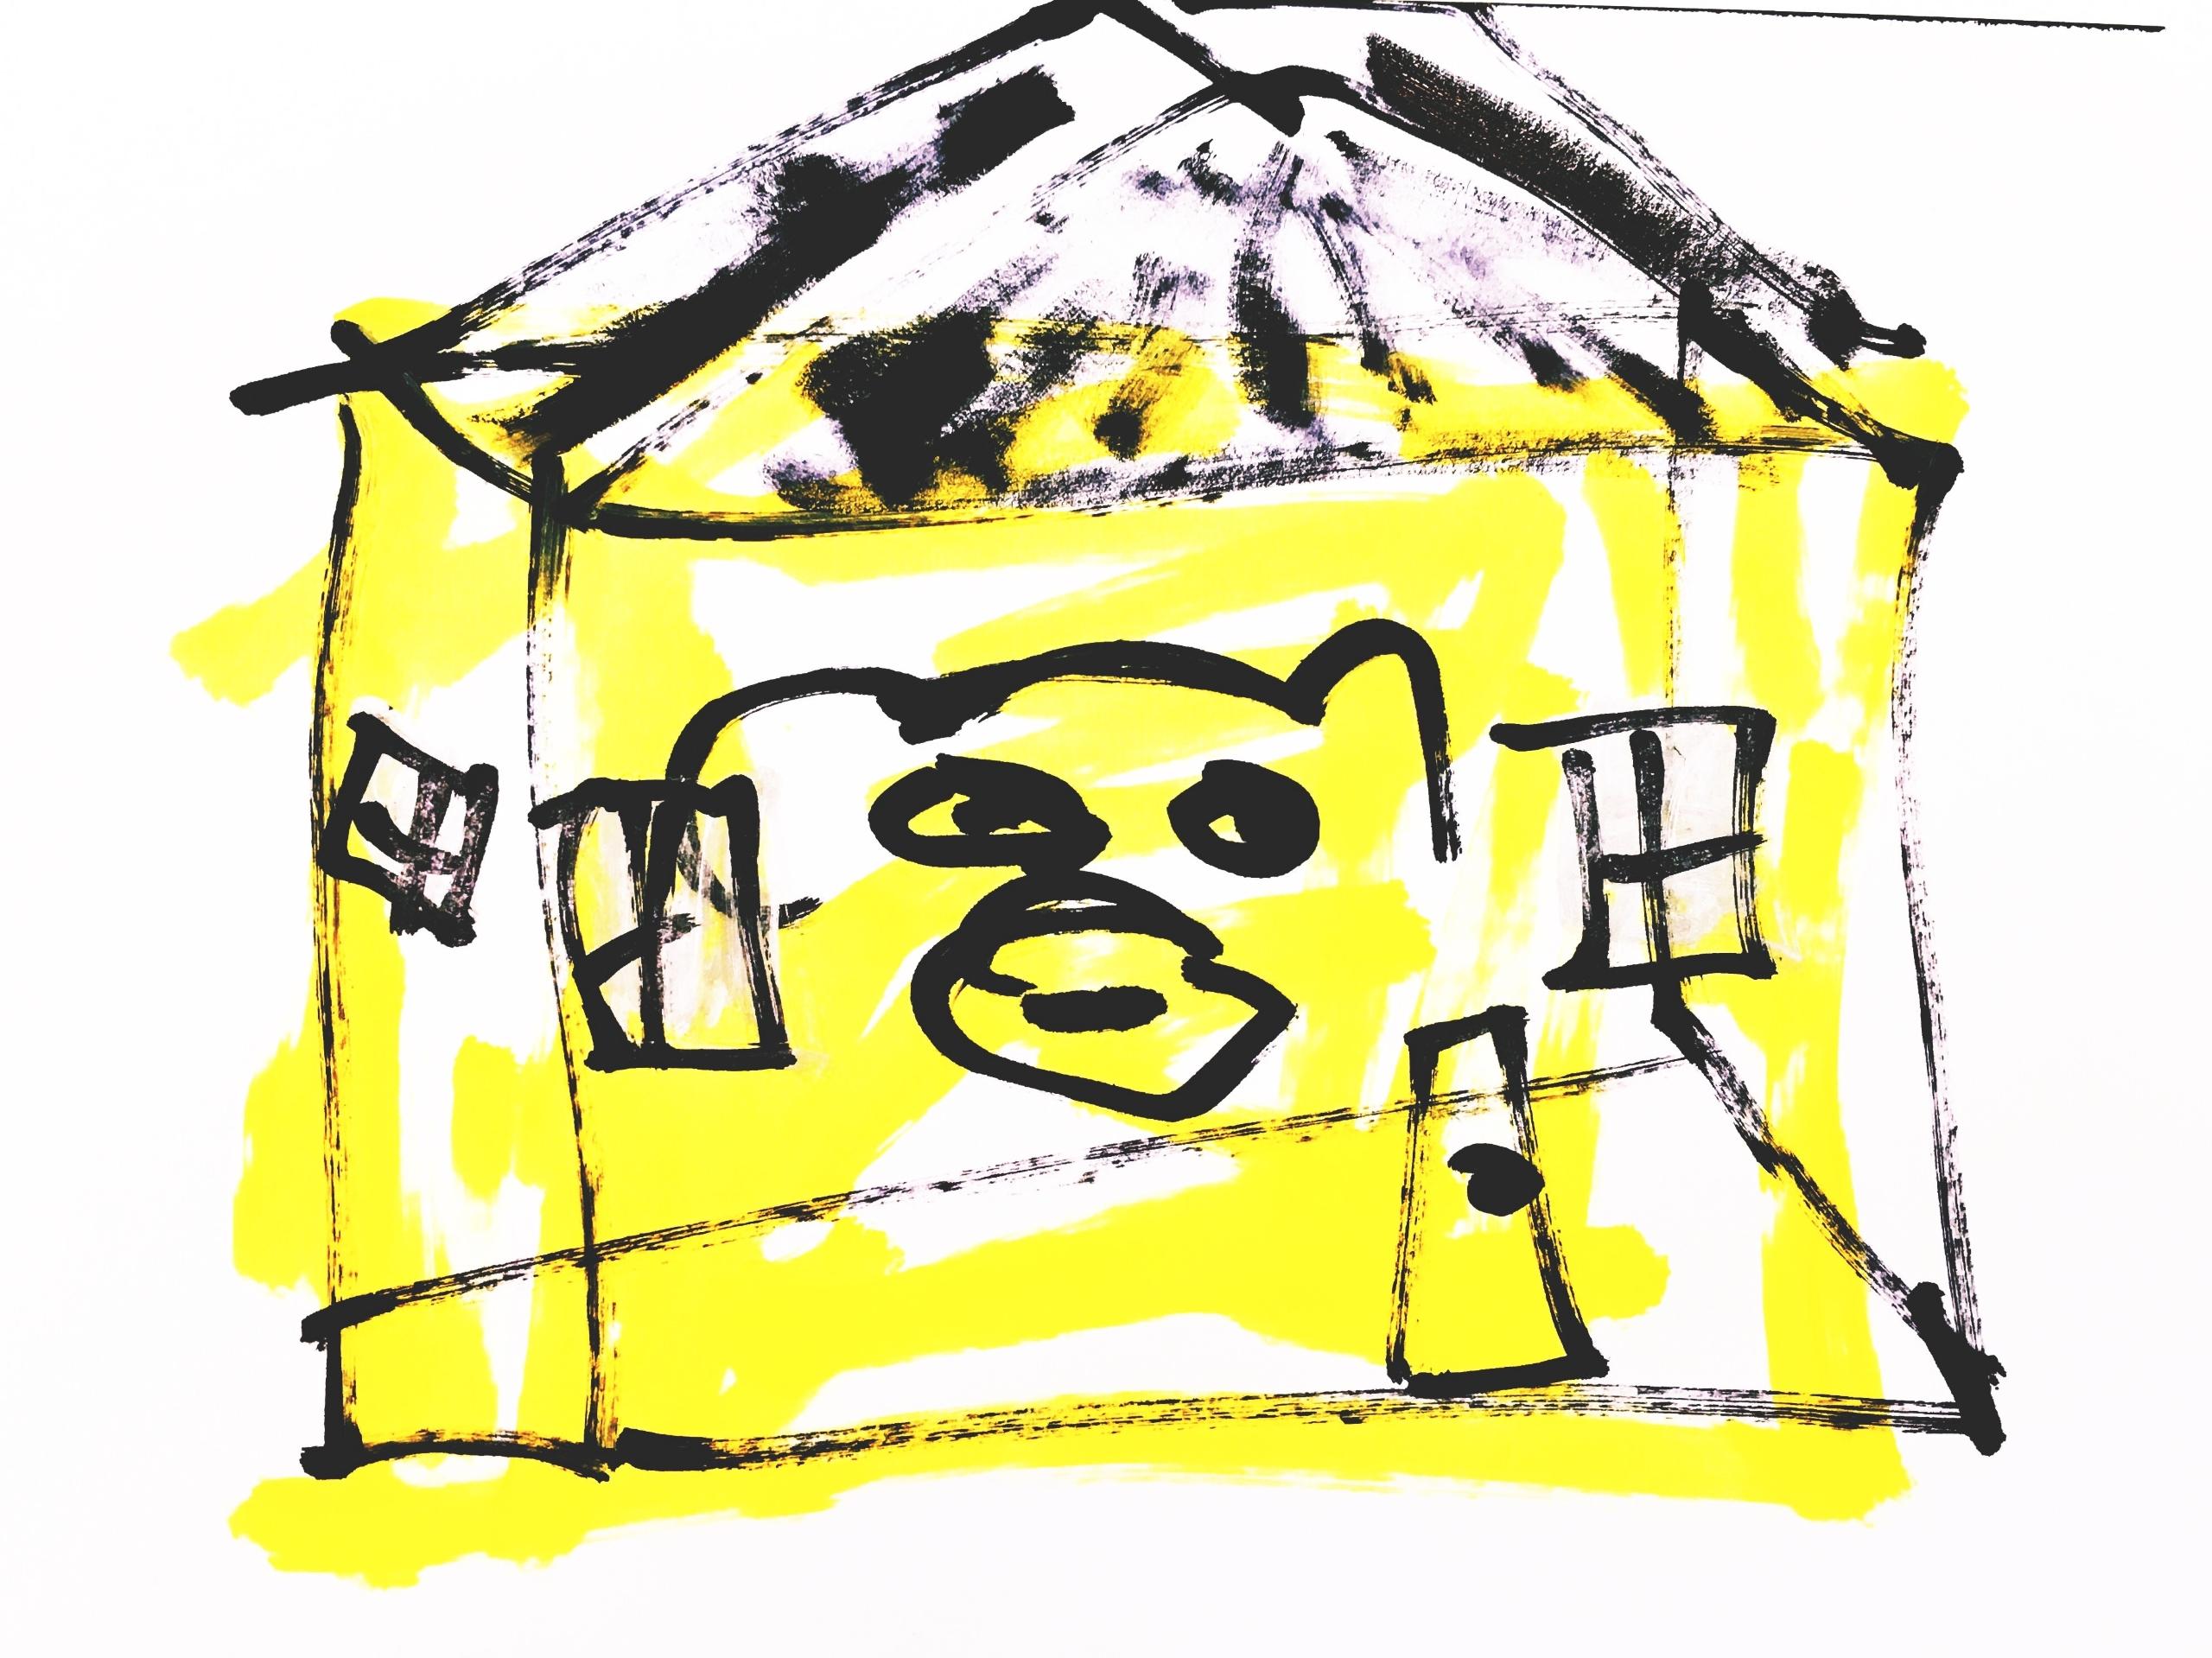 Bear Poorly Constructed Yellow  - jkalamarz | ello